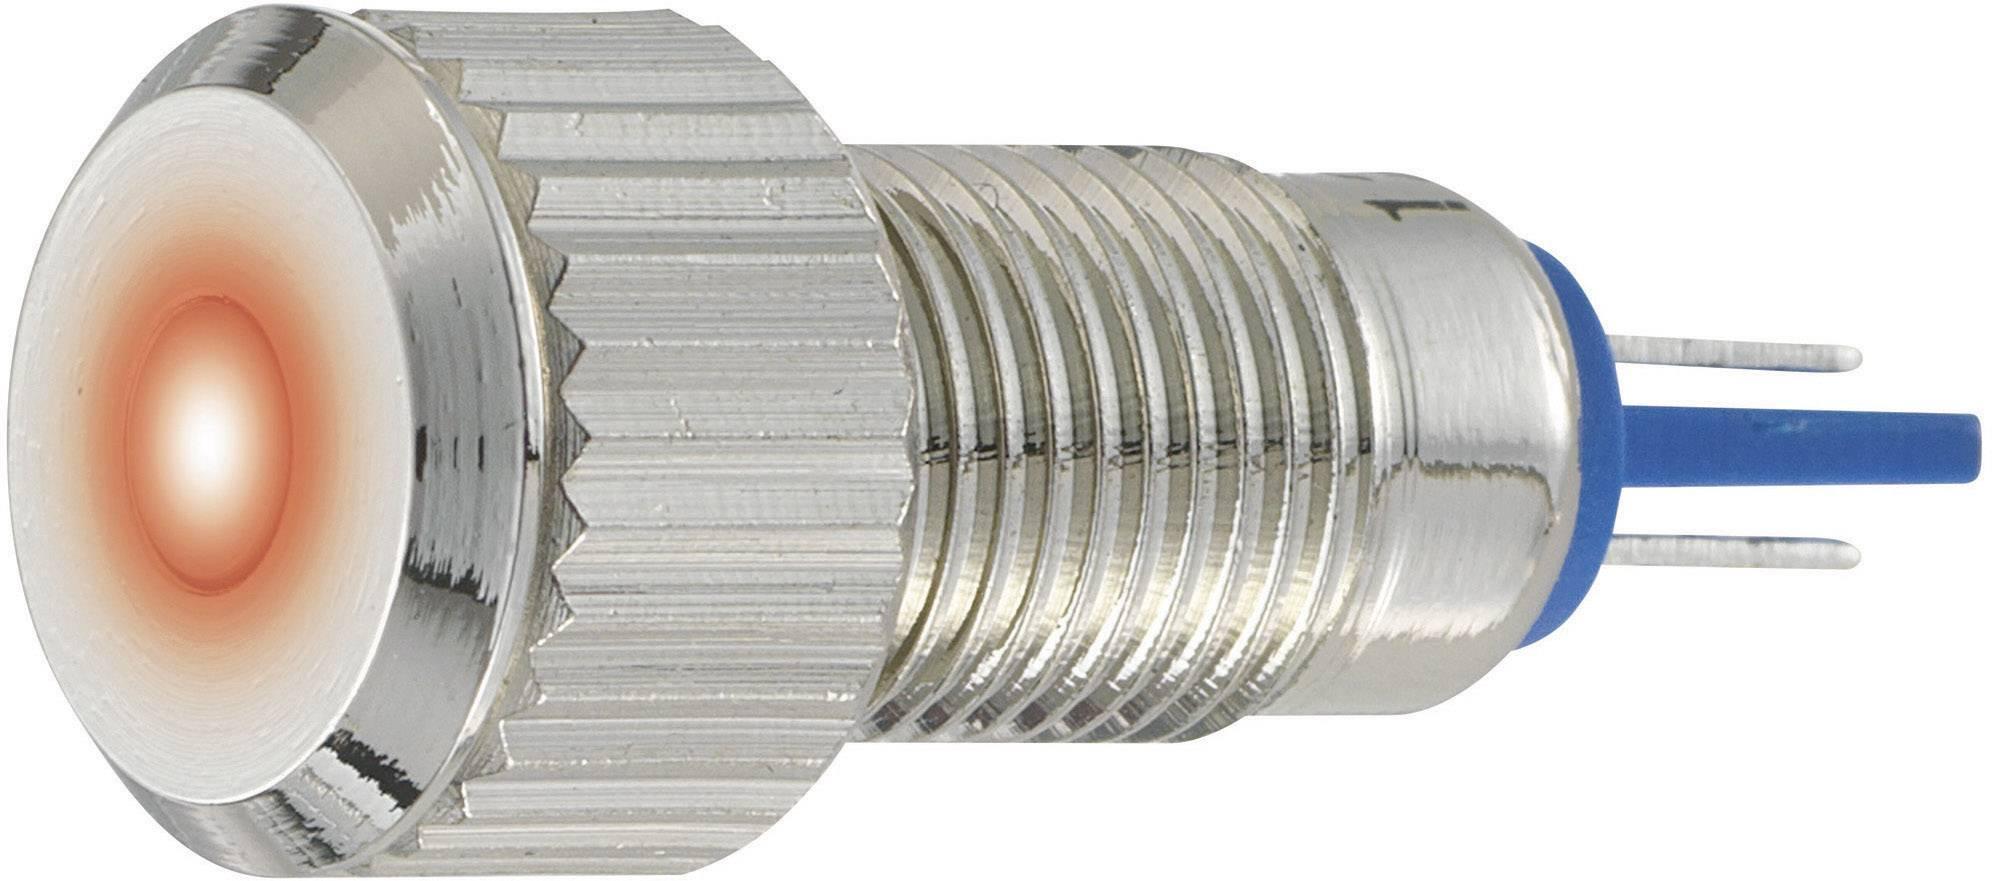 LED signálka GQ8F-D/R/12V/N, IP67, 12 V, poniklovaná mosaz, červená